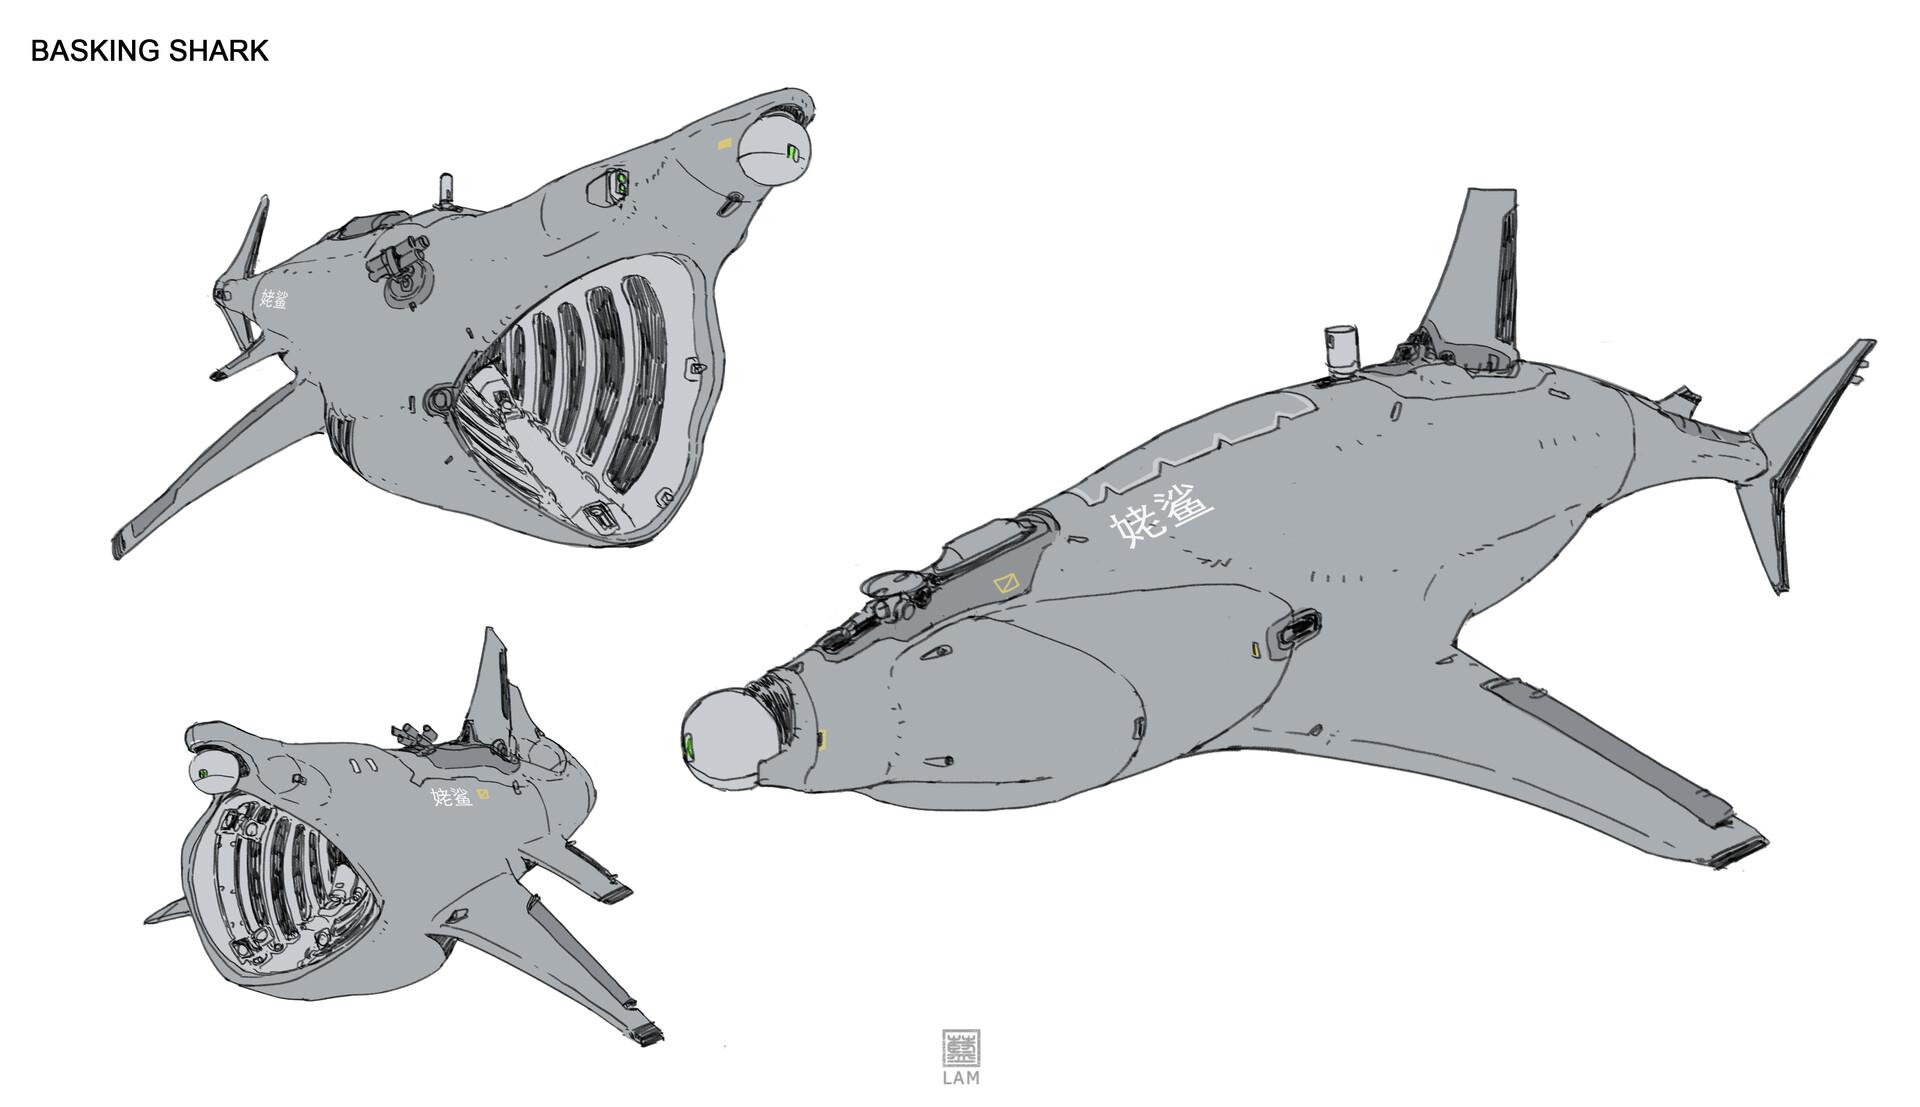 Sheng lam 4 basking shark